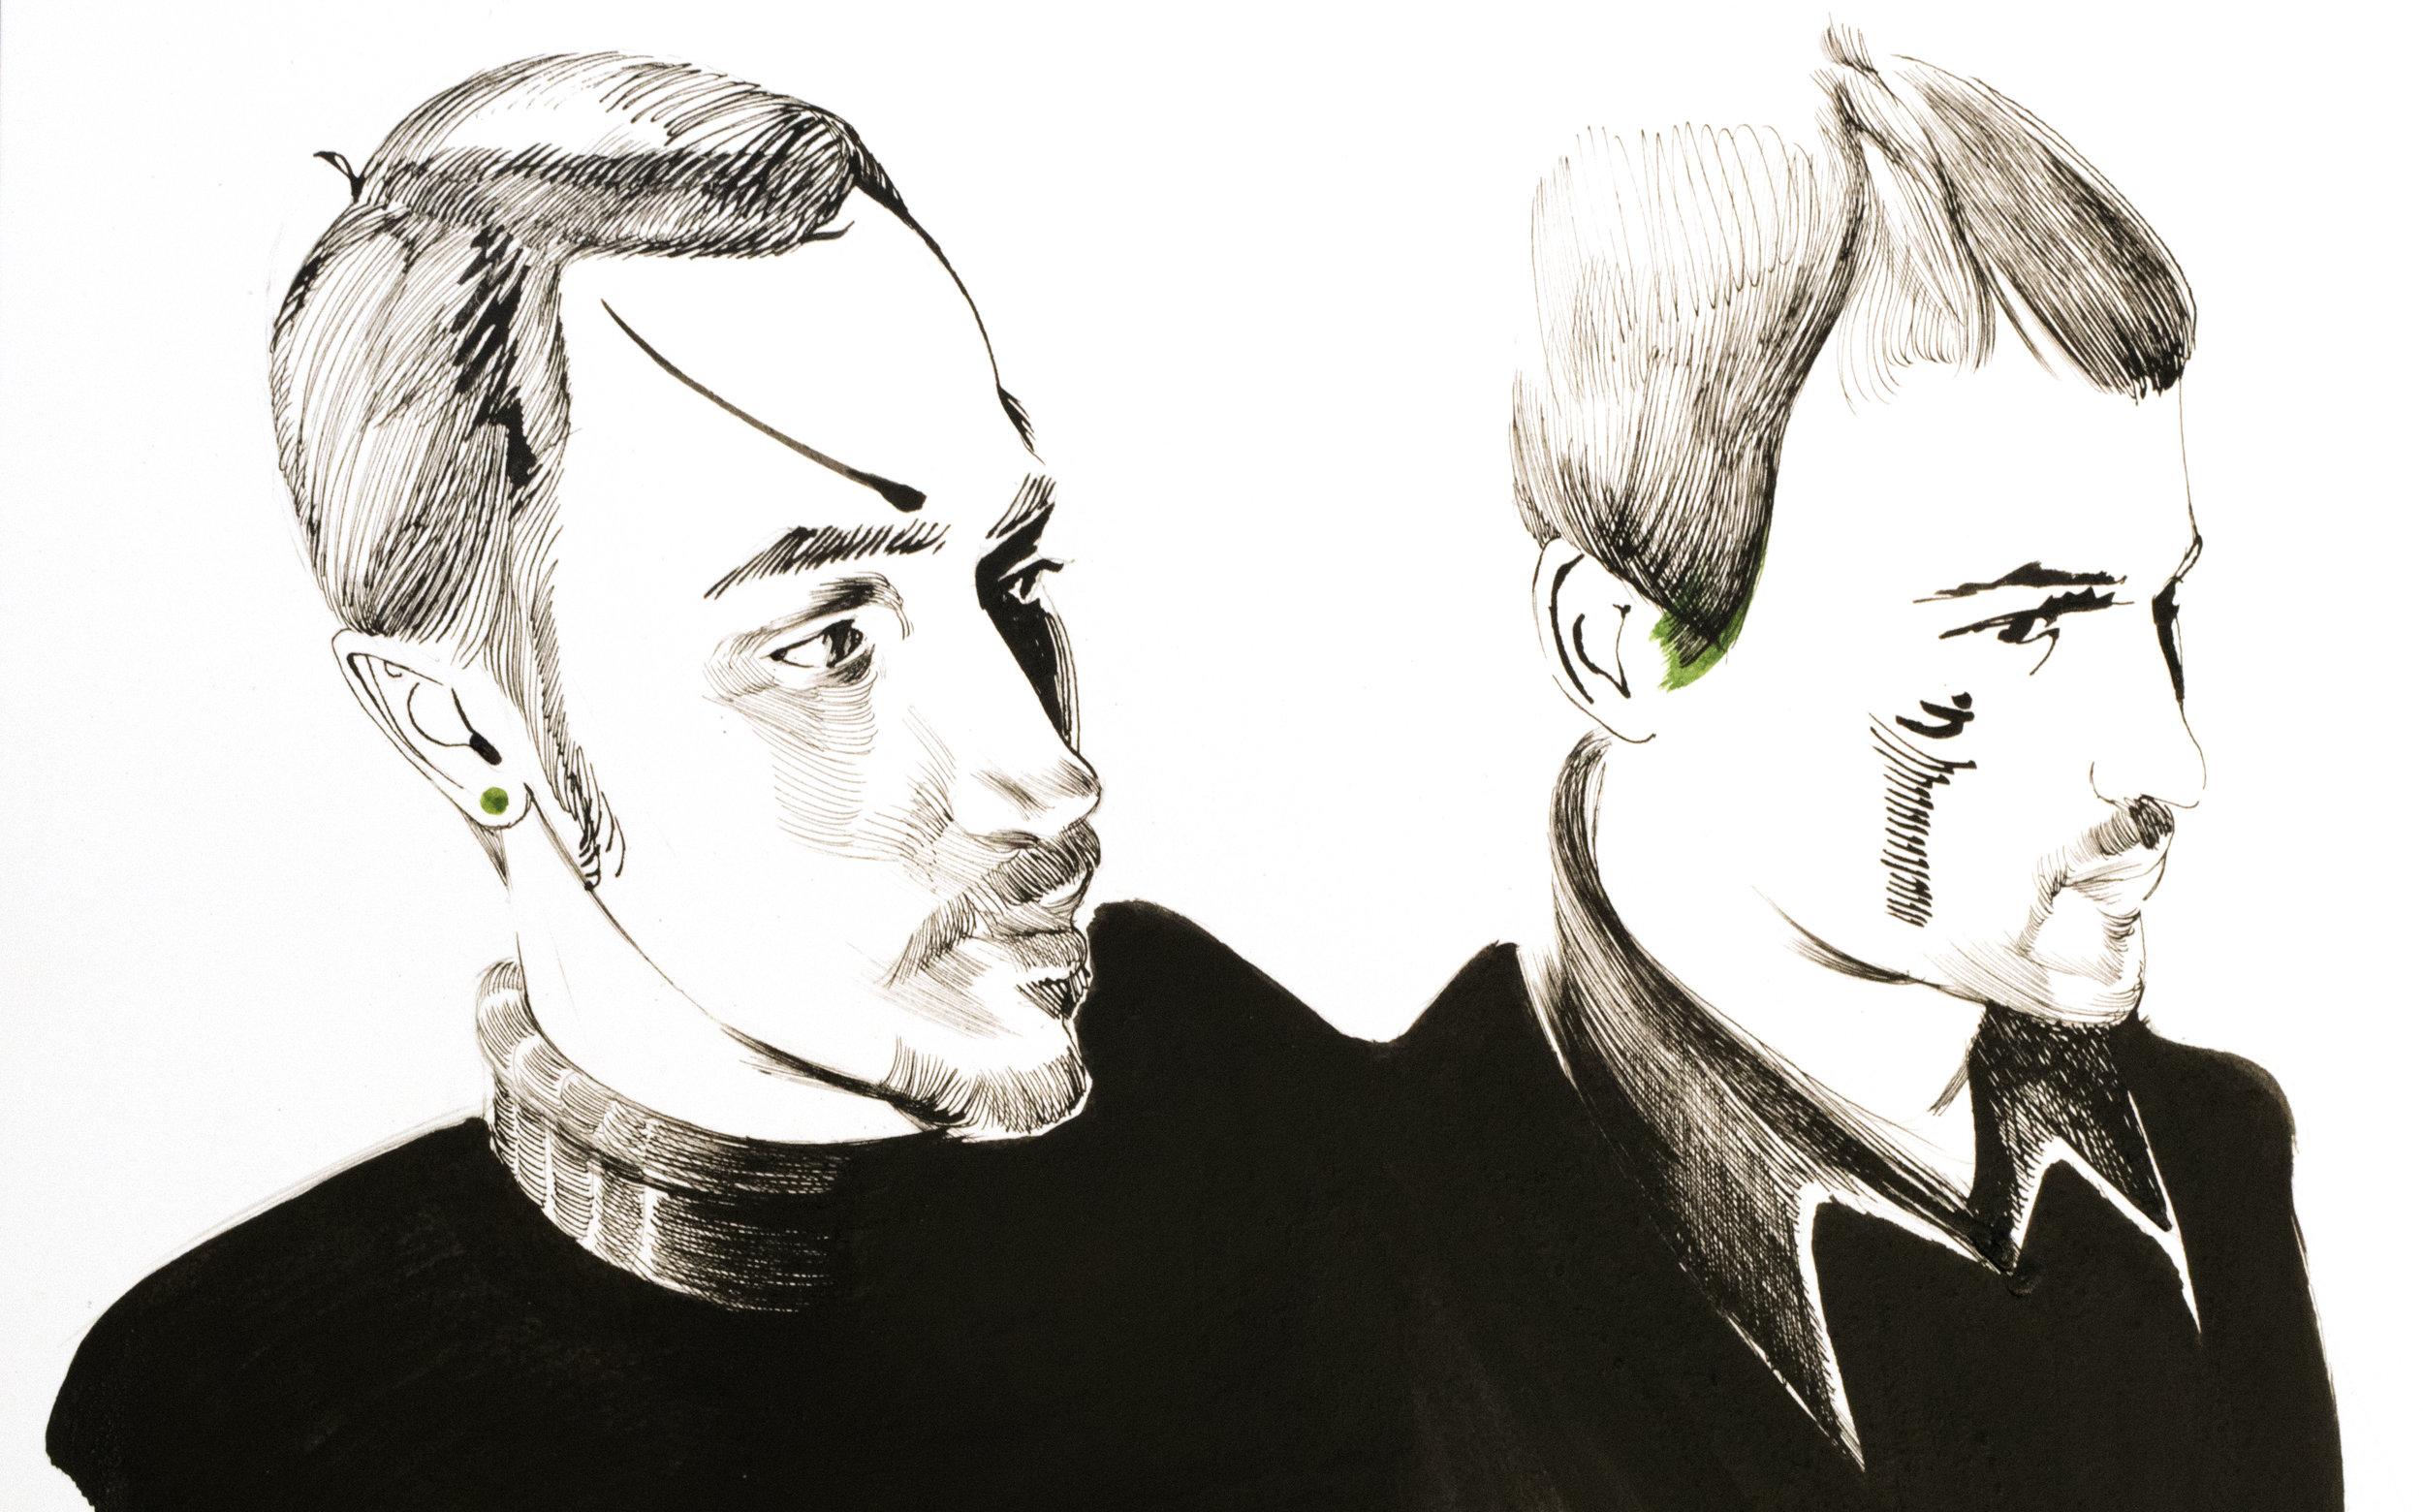 Miles Lewis & Steven Van - Miles' Site & Steven's Site